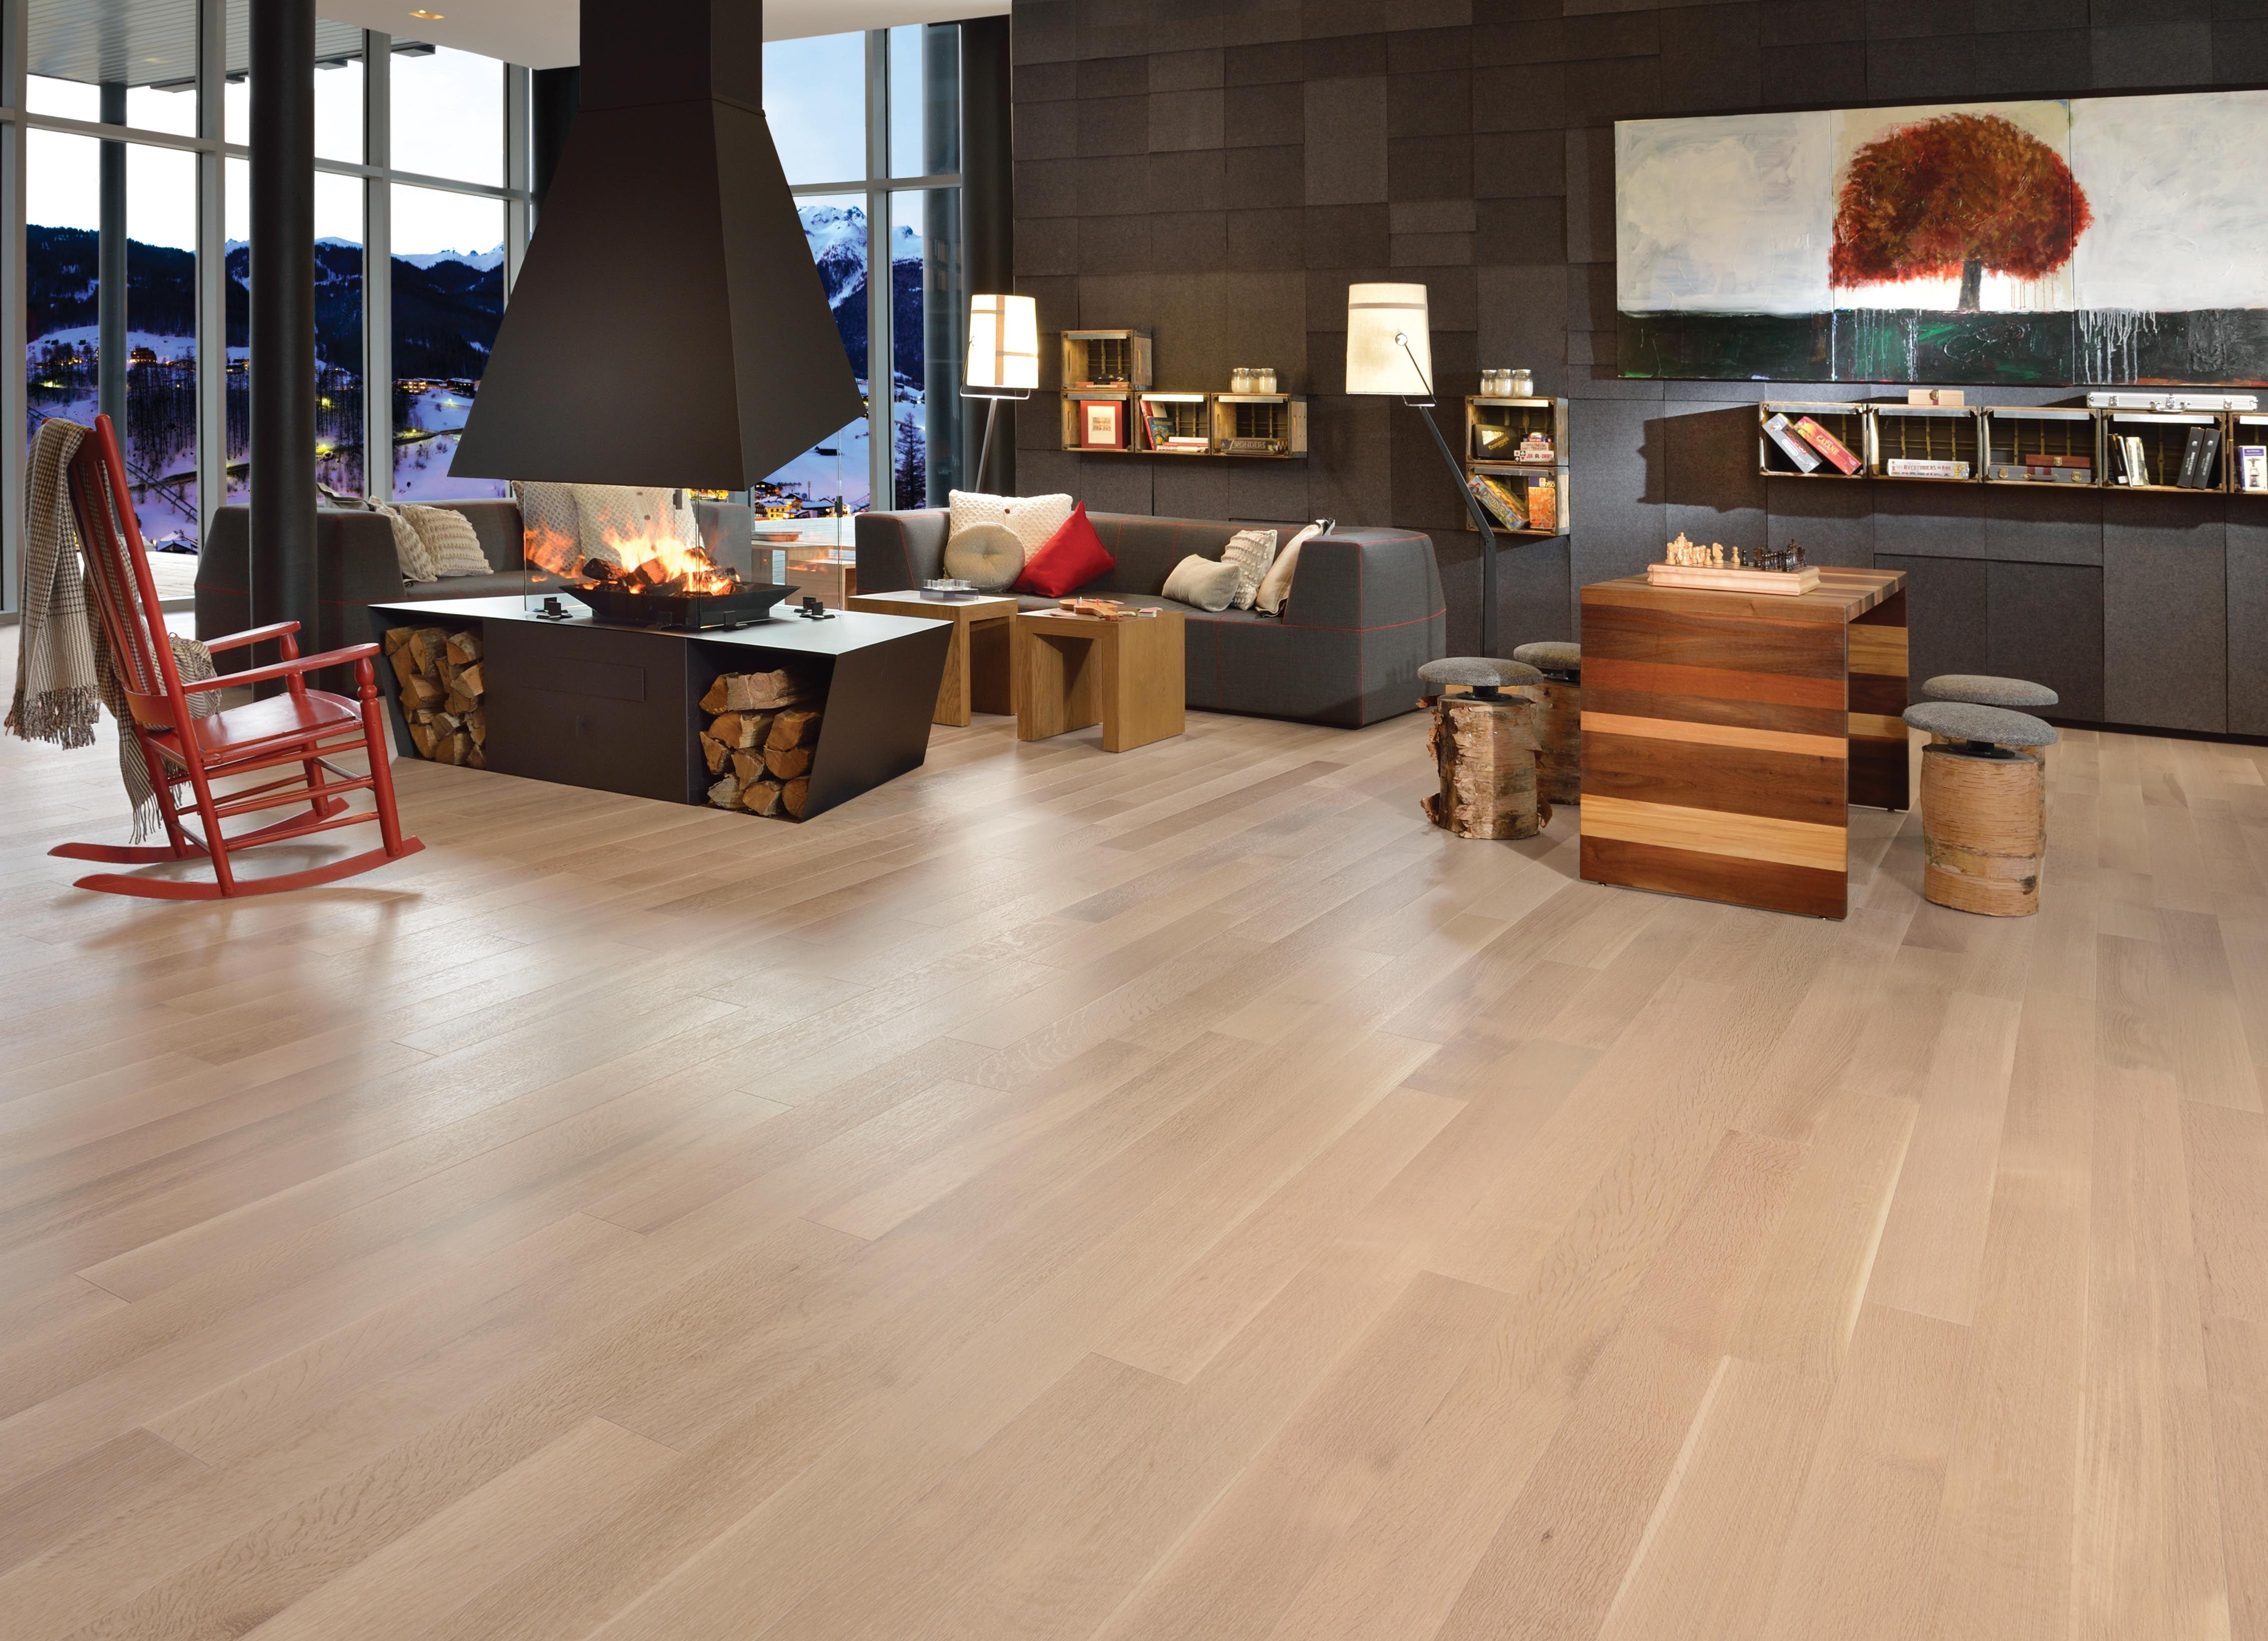 chevron! -mirage hardwood floor maple natural herringbone pattern